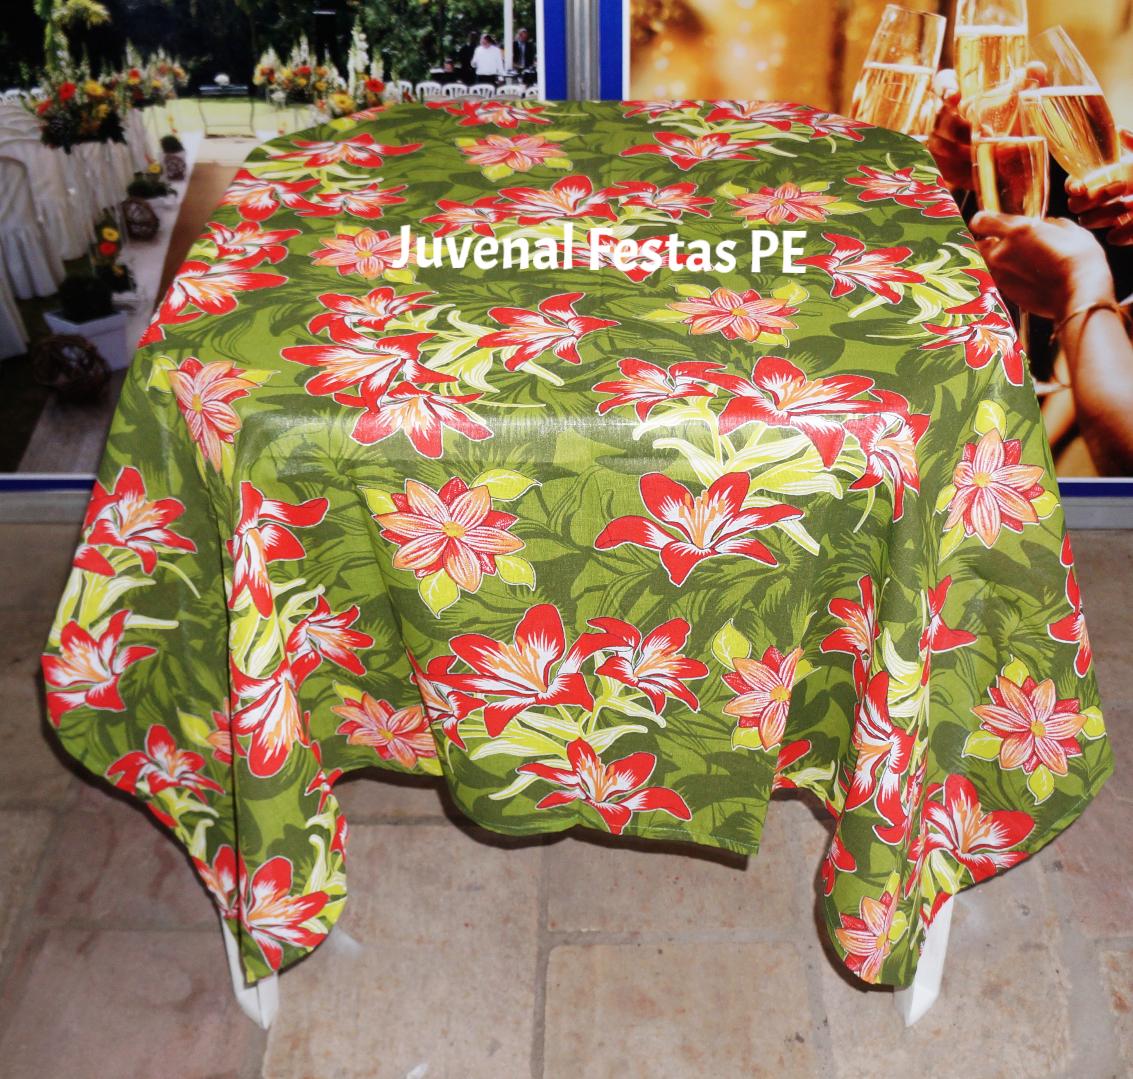 Toalha de chita / floral verde